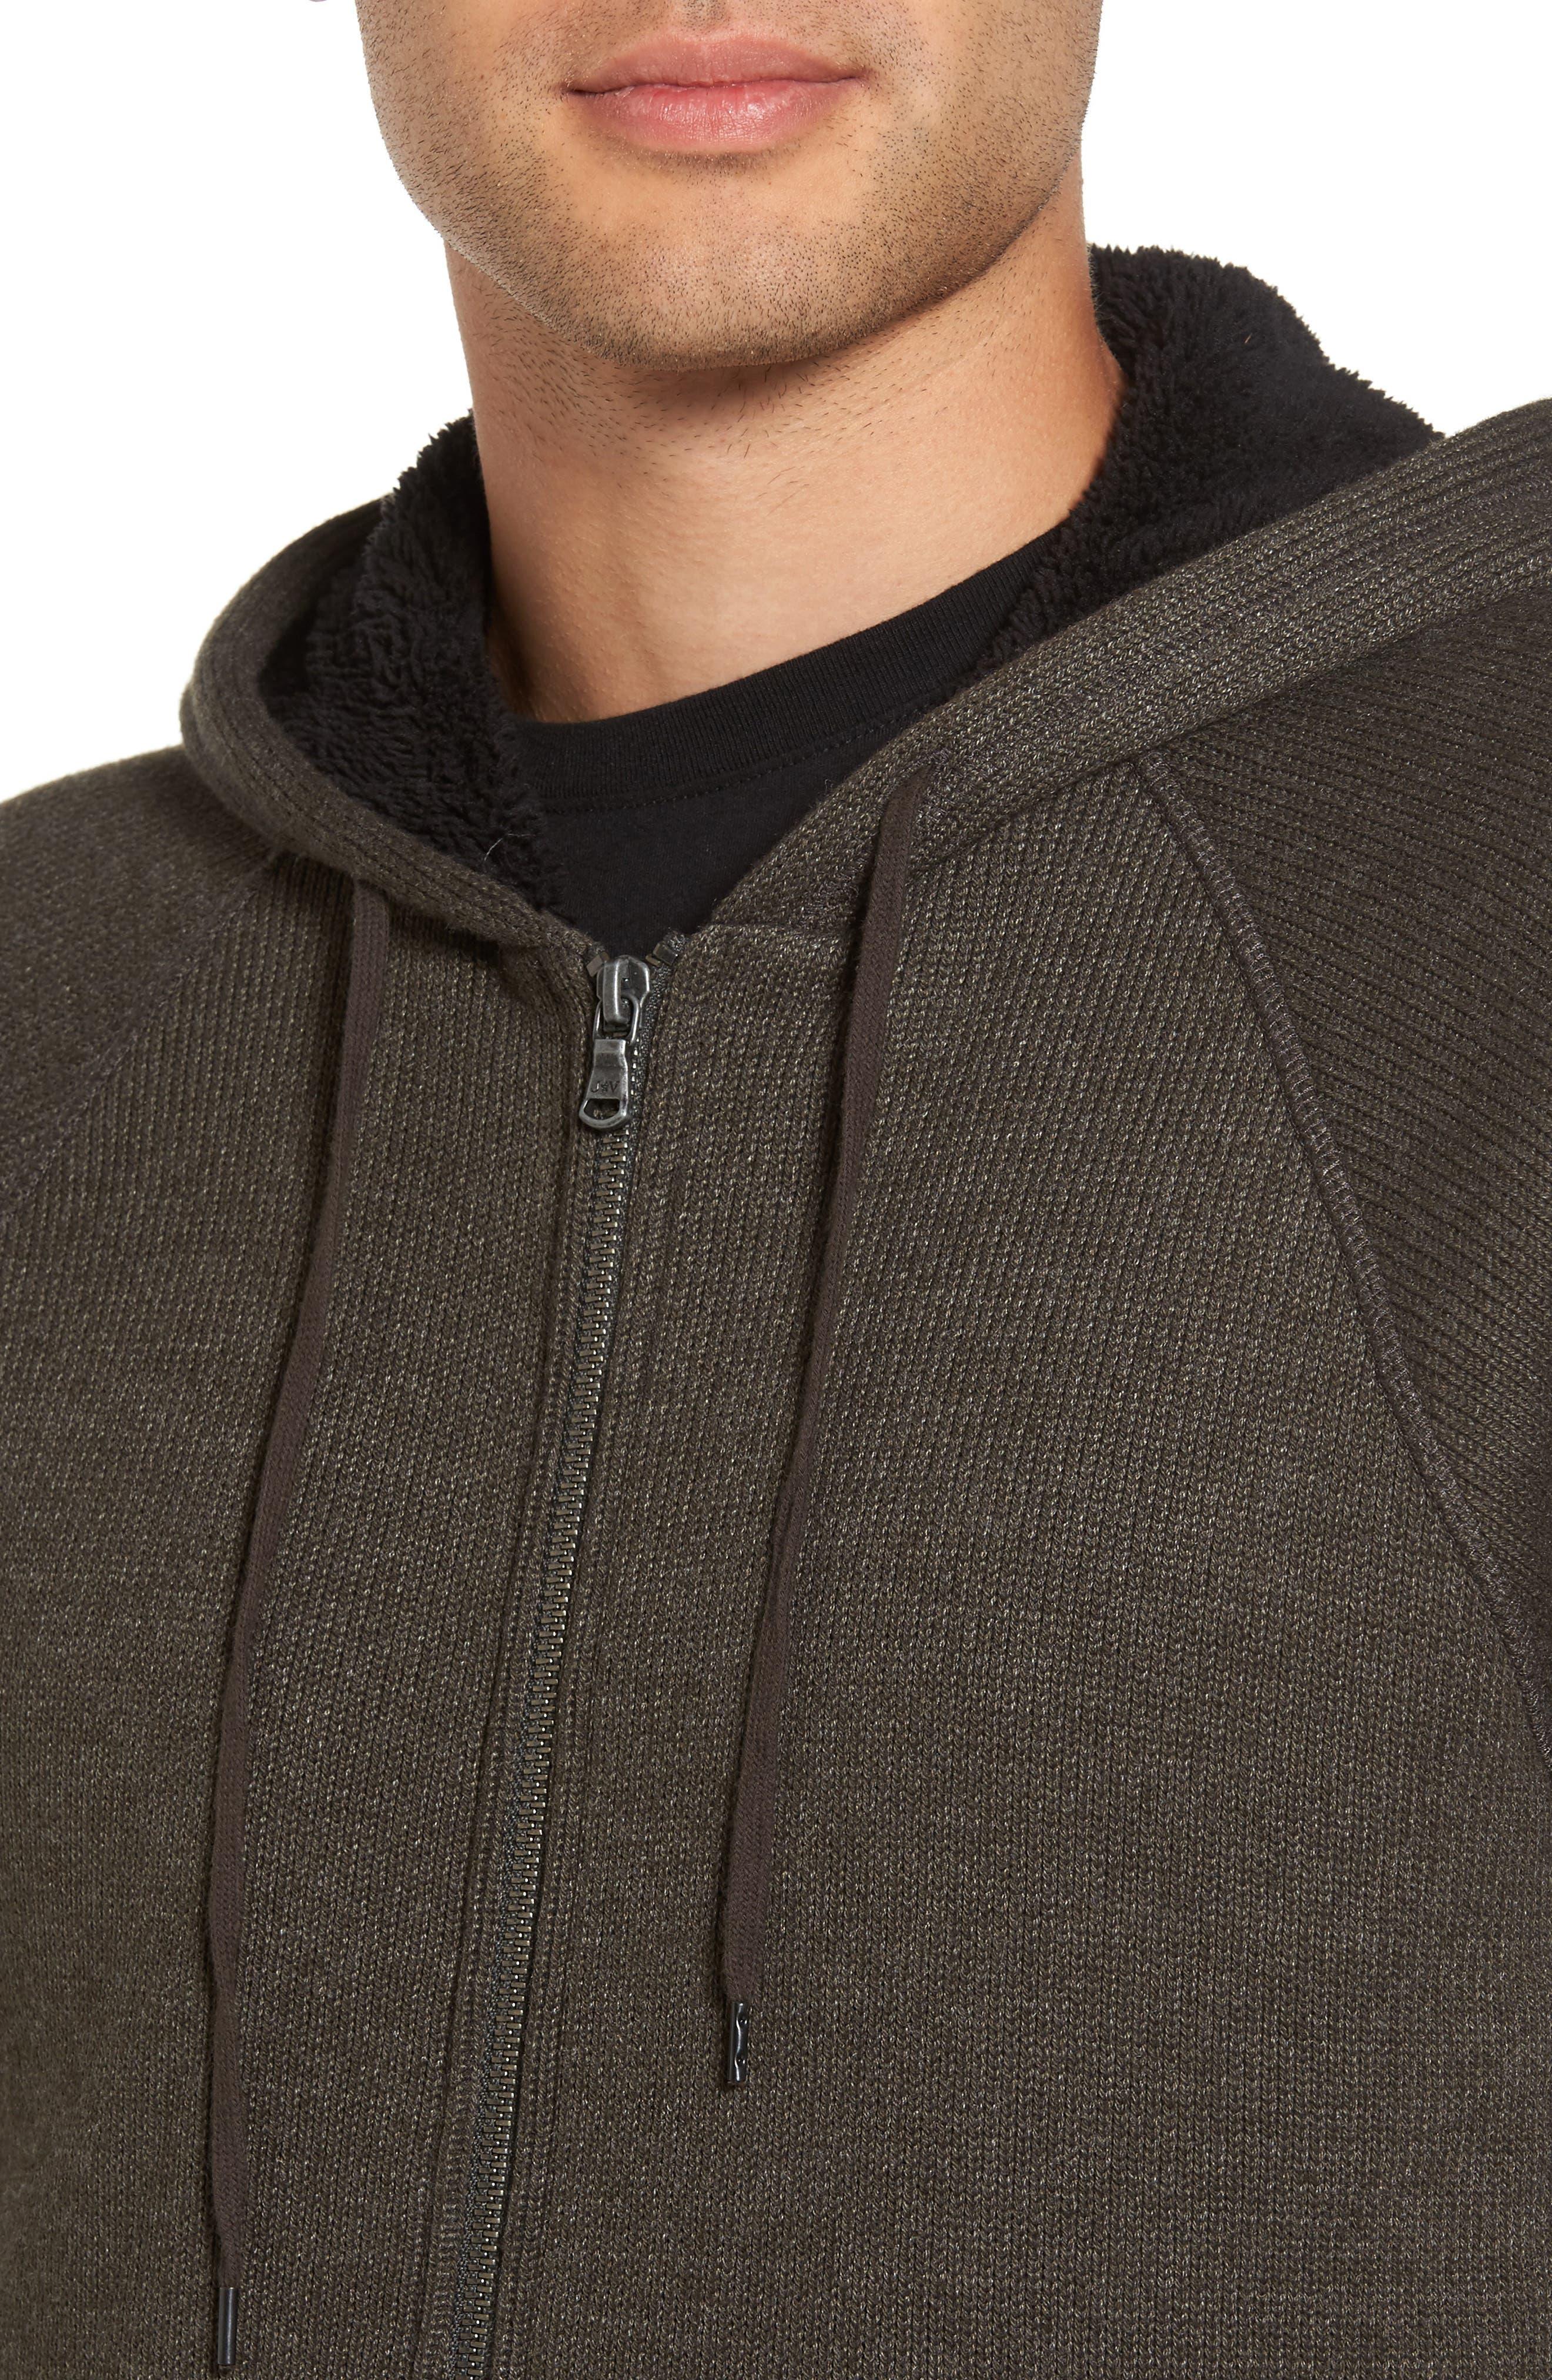 Fleece Lined Zip Hoodie,                             Alternate thumbnail 4, color,                             391